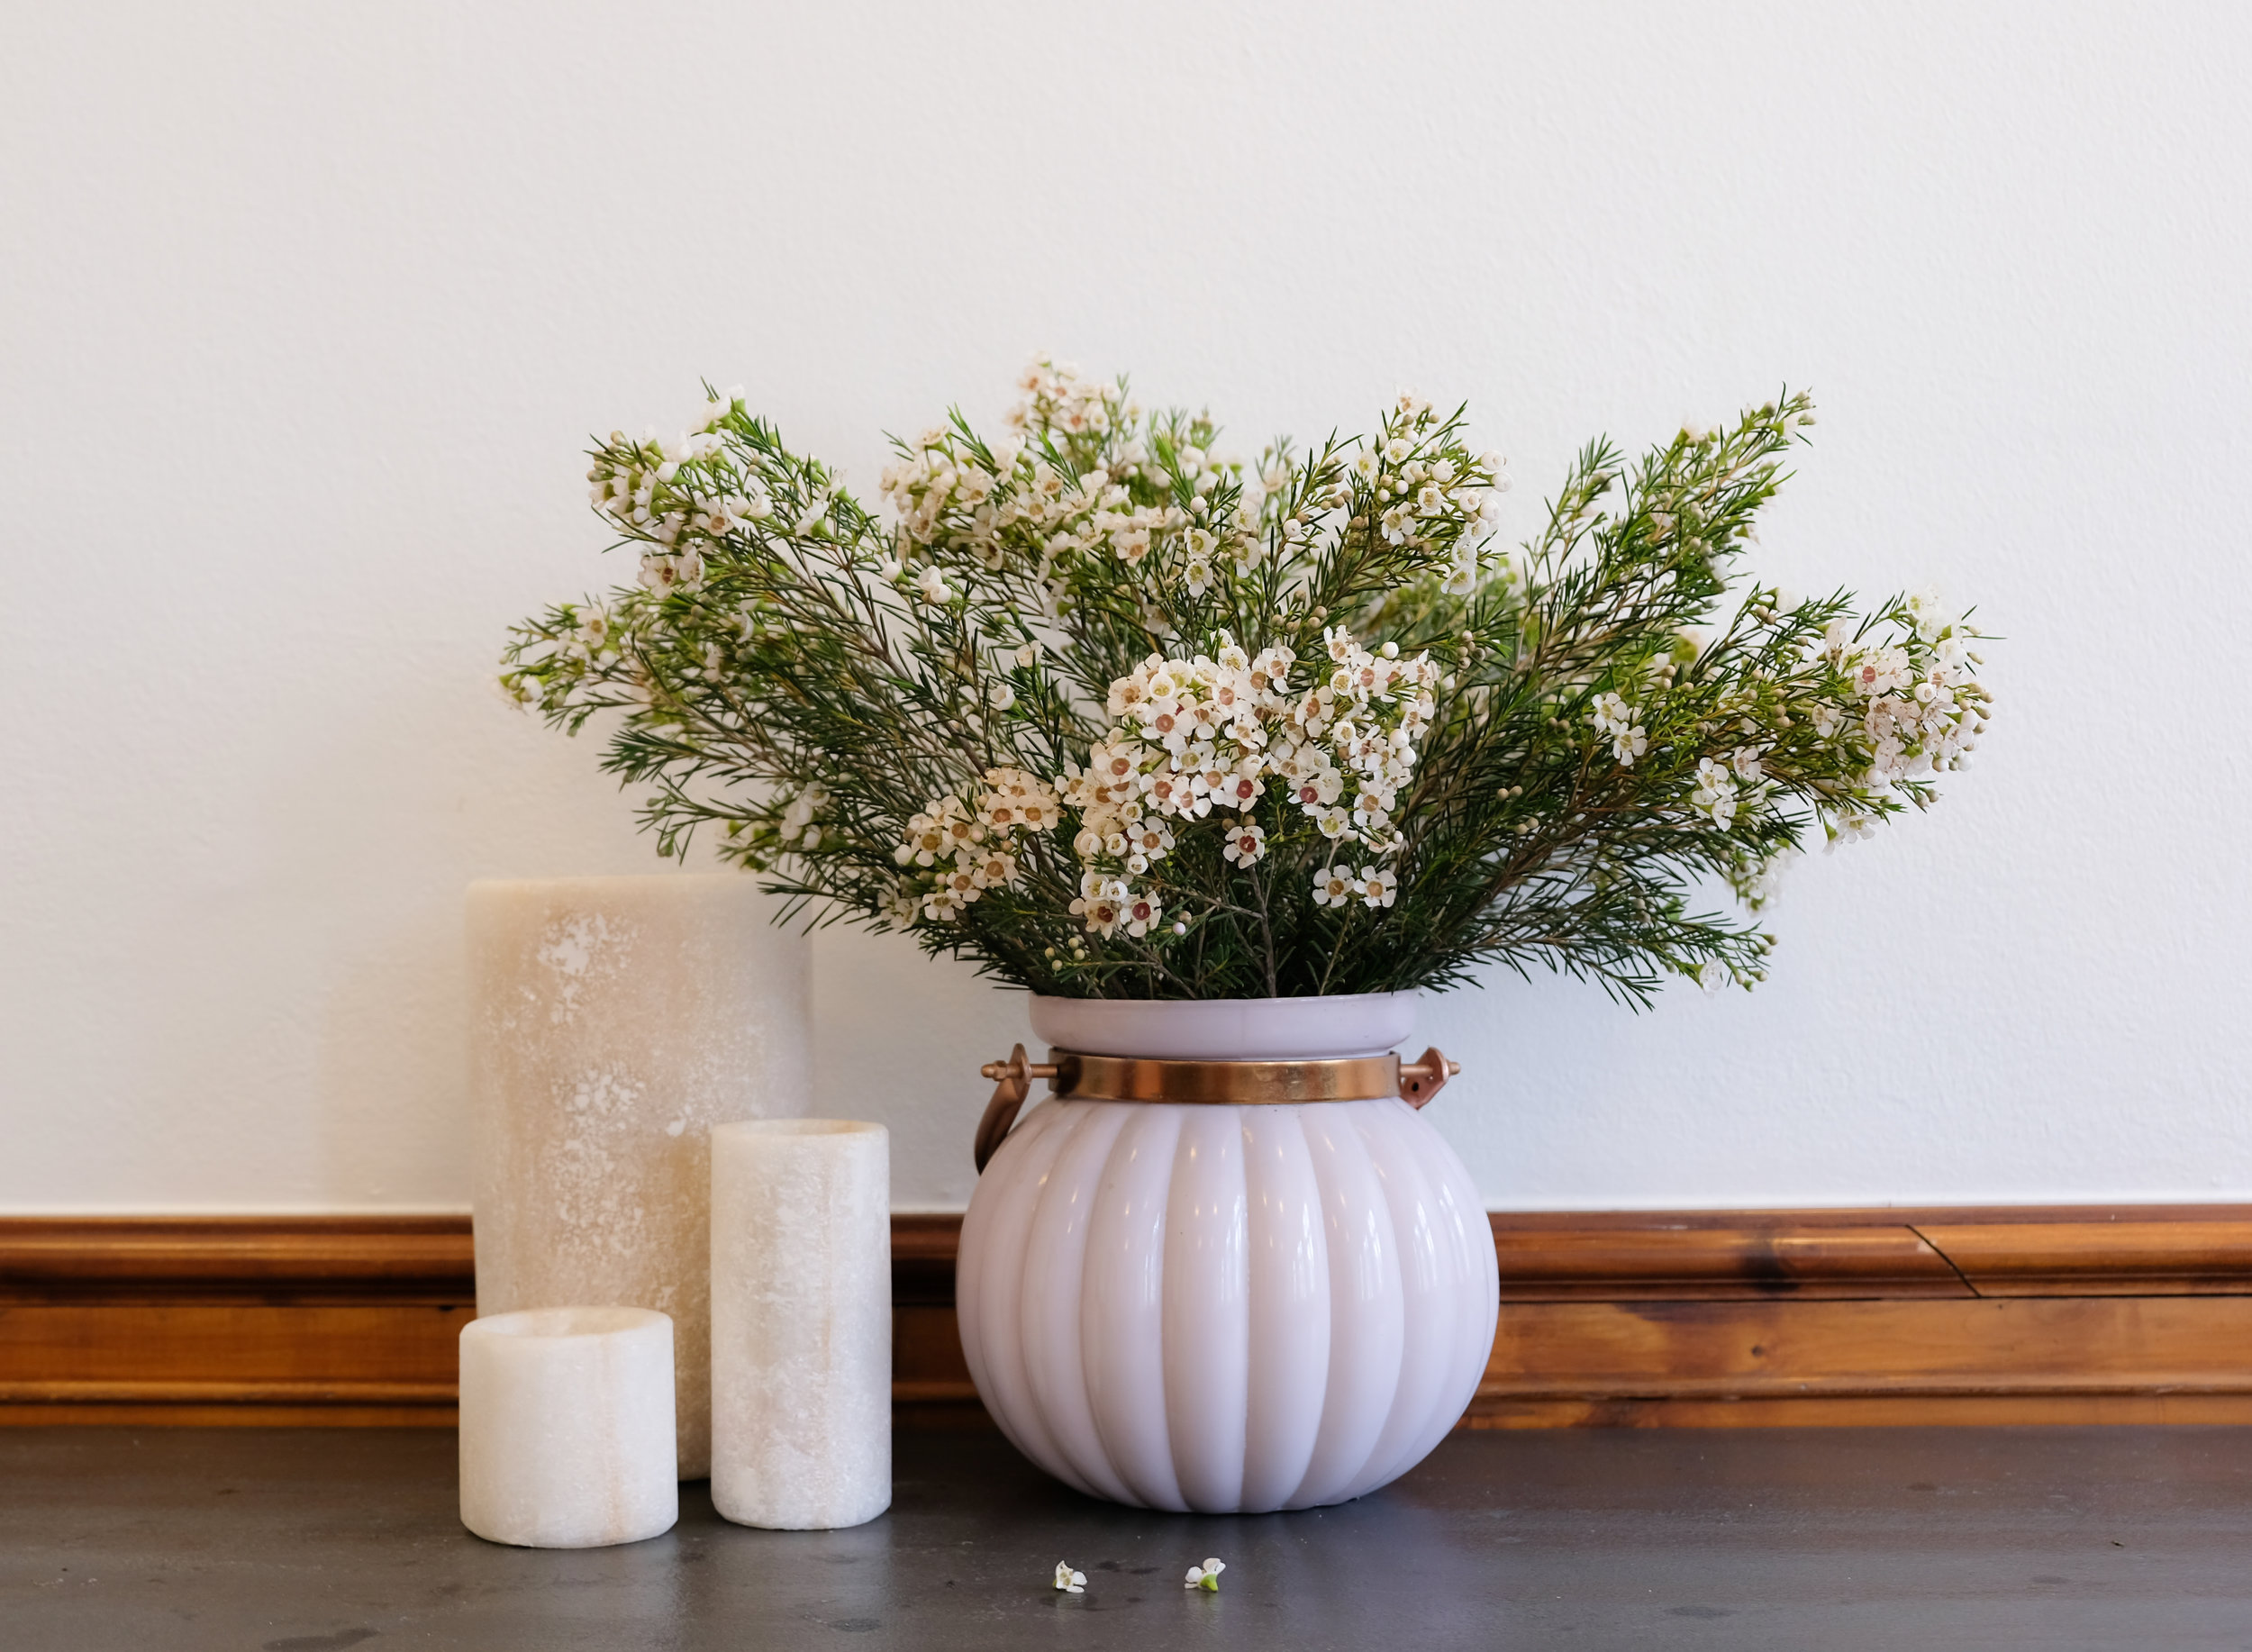 aromaterapi hudpleje kursus